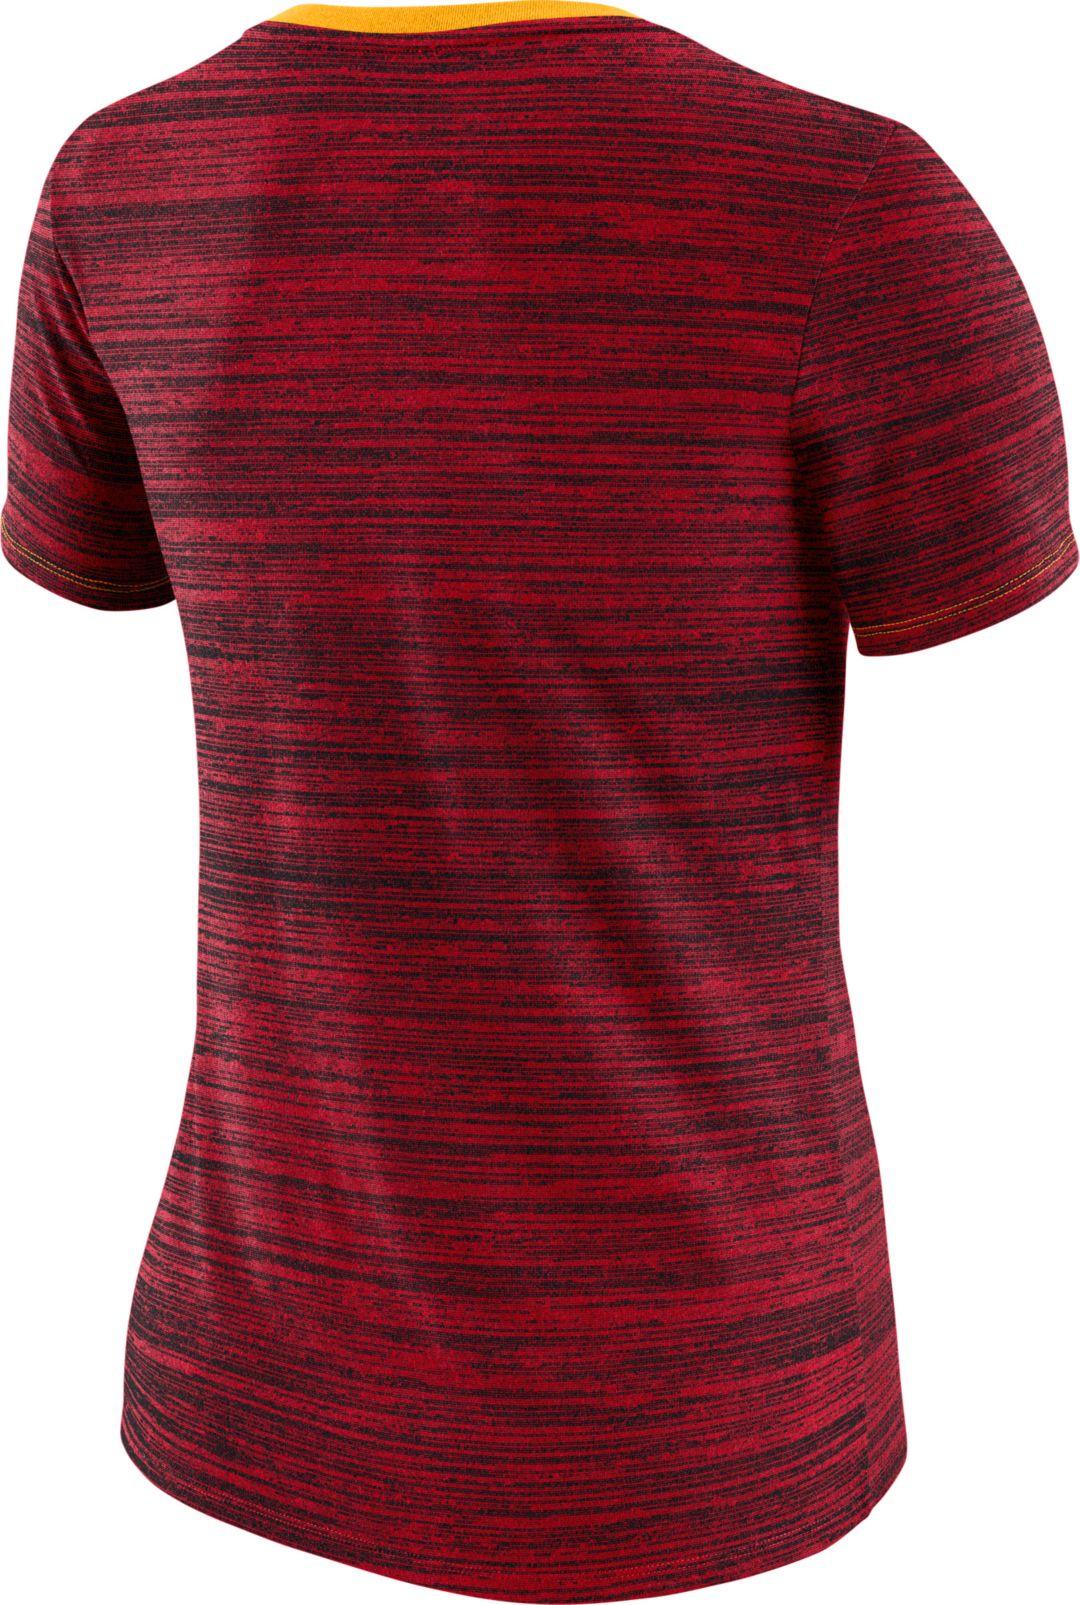 cheap for discount 7d638 91671 Nike Women's Kansas City Chiefs Legend Velocity Performance Red T-Shirt